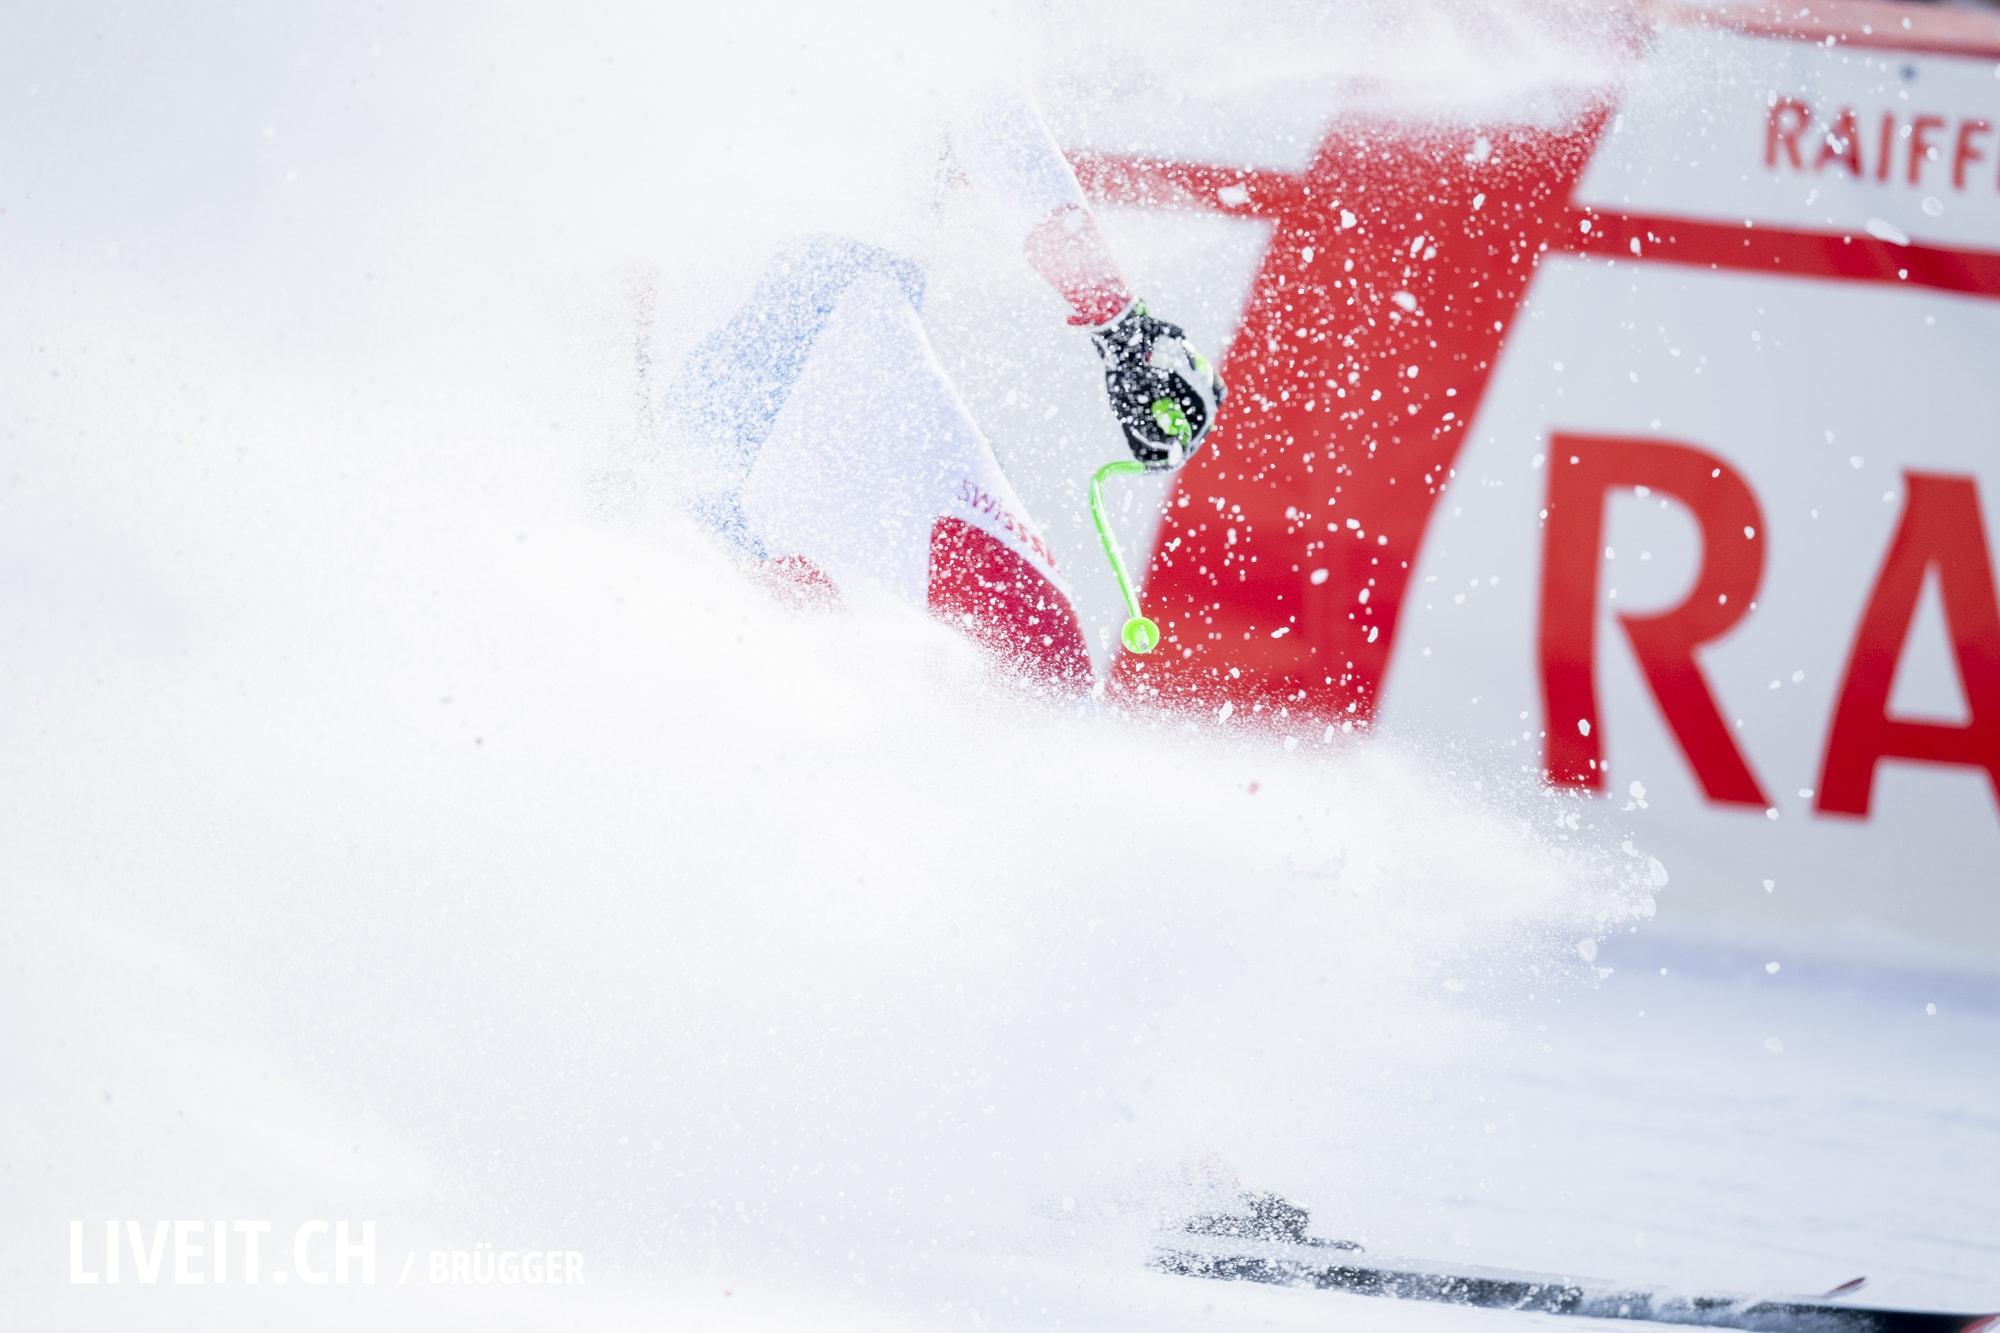 Carlo Janka (SUI) fotografiert am Freitag, 18. Januar 2019 am Lauberhornrennen in der Disziplin: Slalom Alpine Kombination. (Fotografiert von Dominic Bruegger liveit.ch)